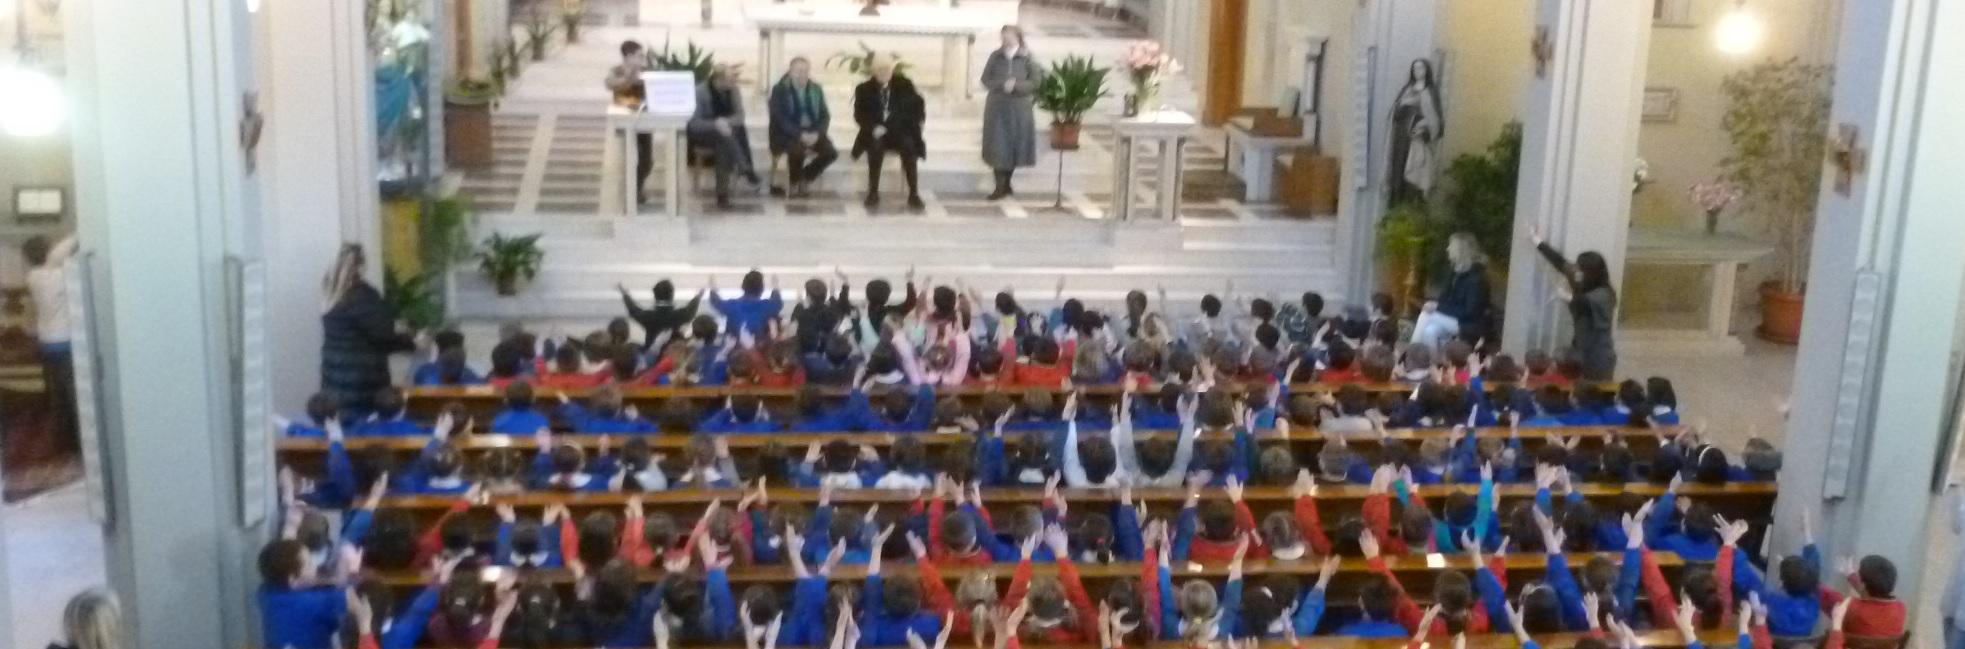 Chieri Santa Teresa: il vescovo fra noi!